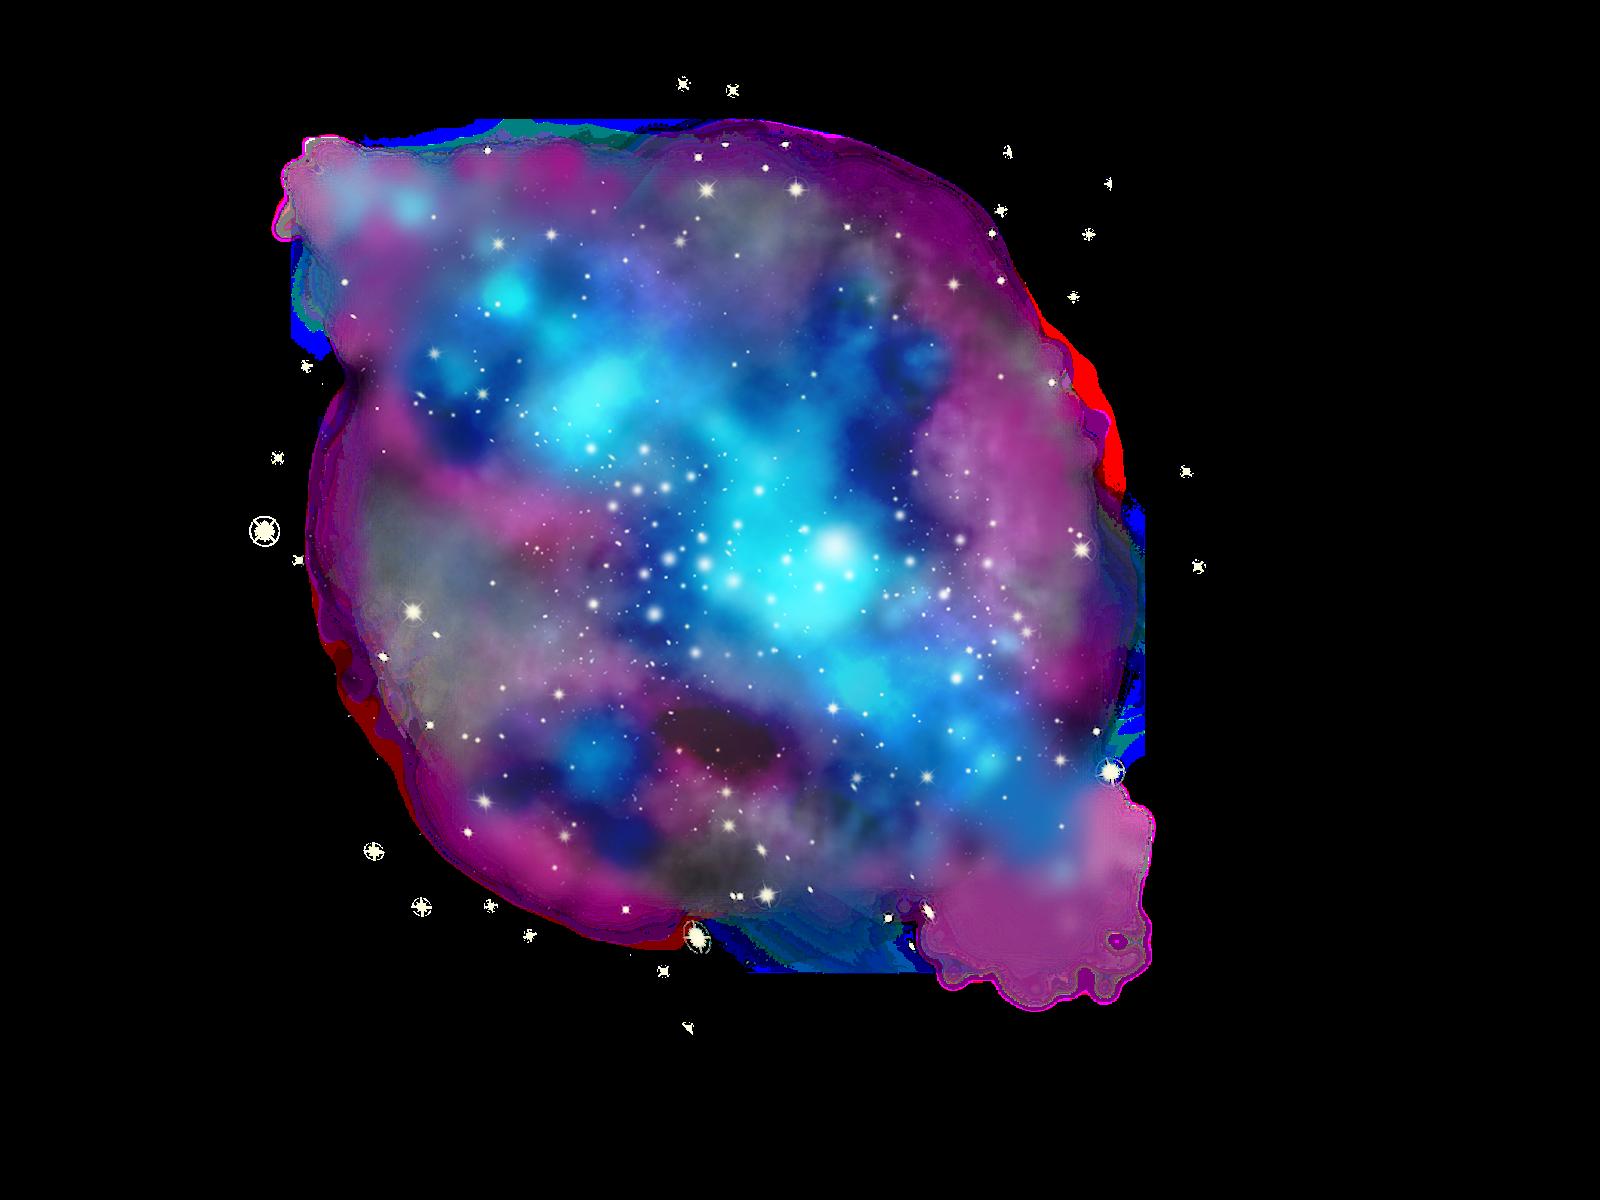 Galaxy clipart star. Danrleysnow s photos drawings